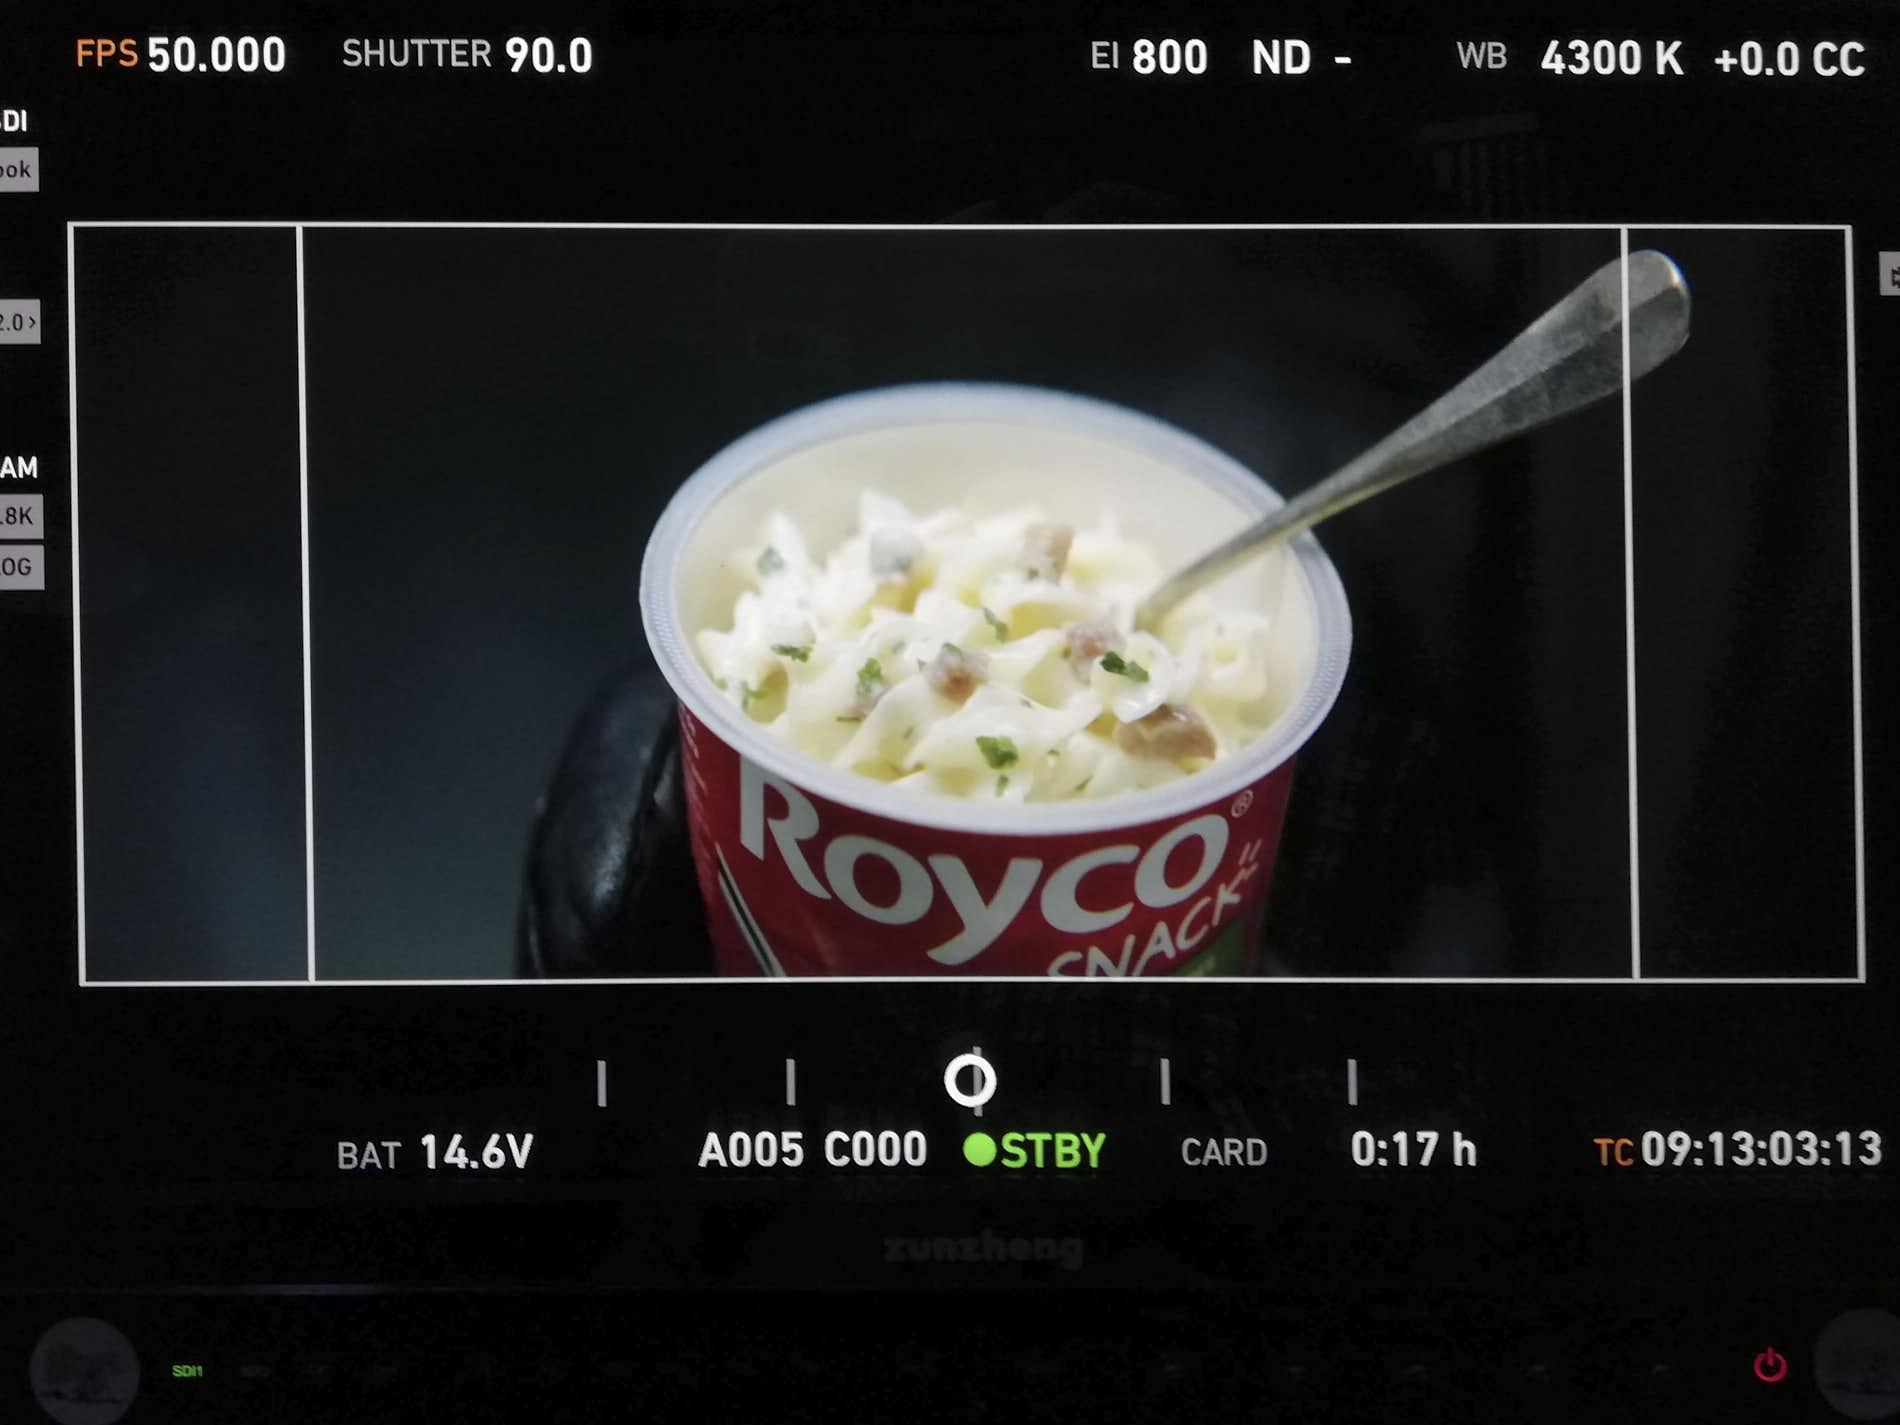 photo of a moviescreen with a close-up of royco snack carbonara